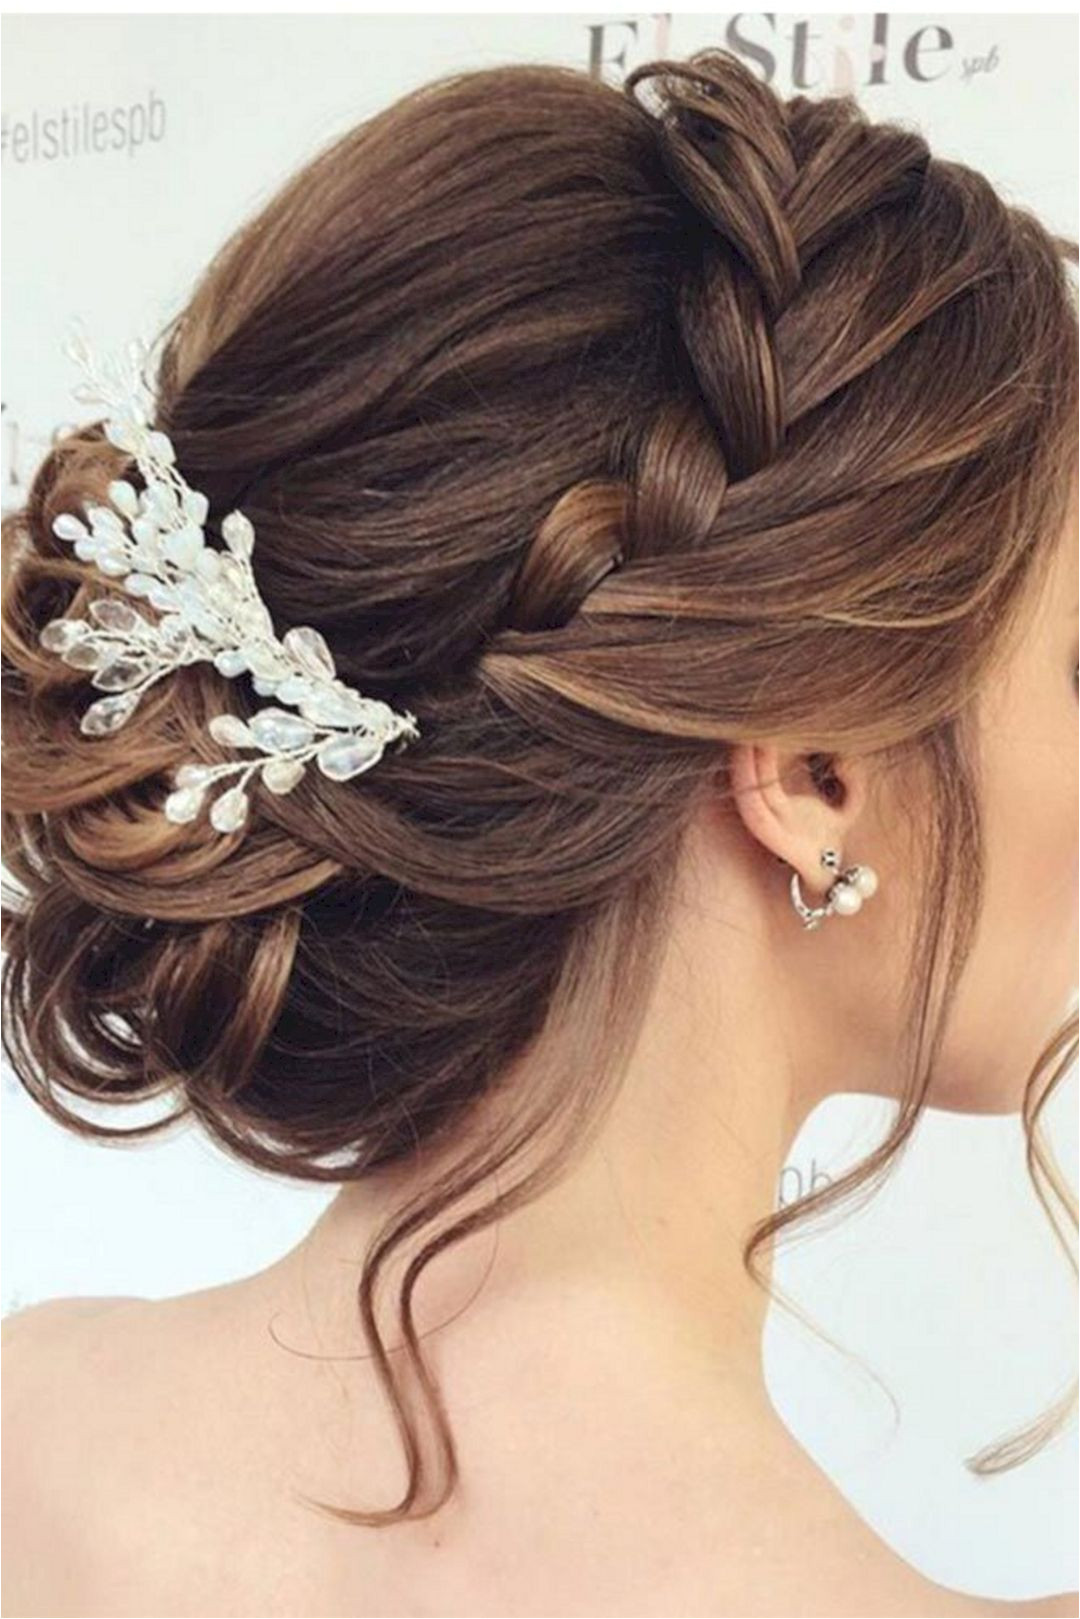 wedding hairstyles for bridesmaids weddinghairstyles